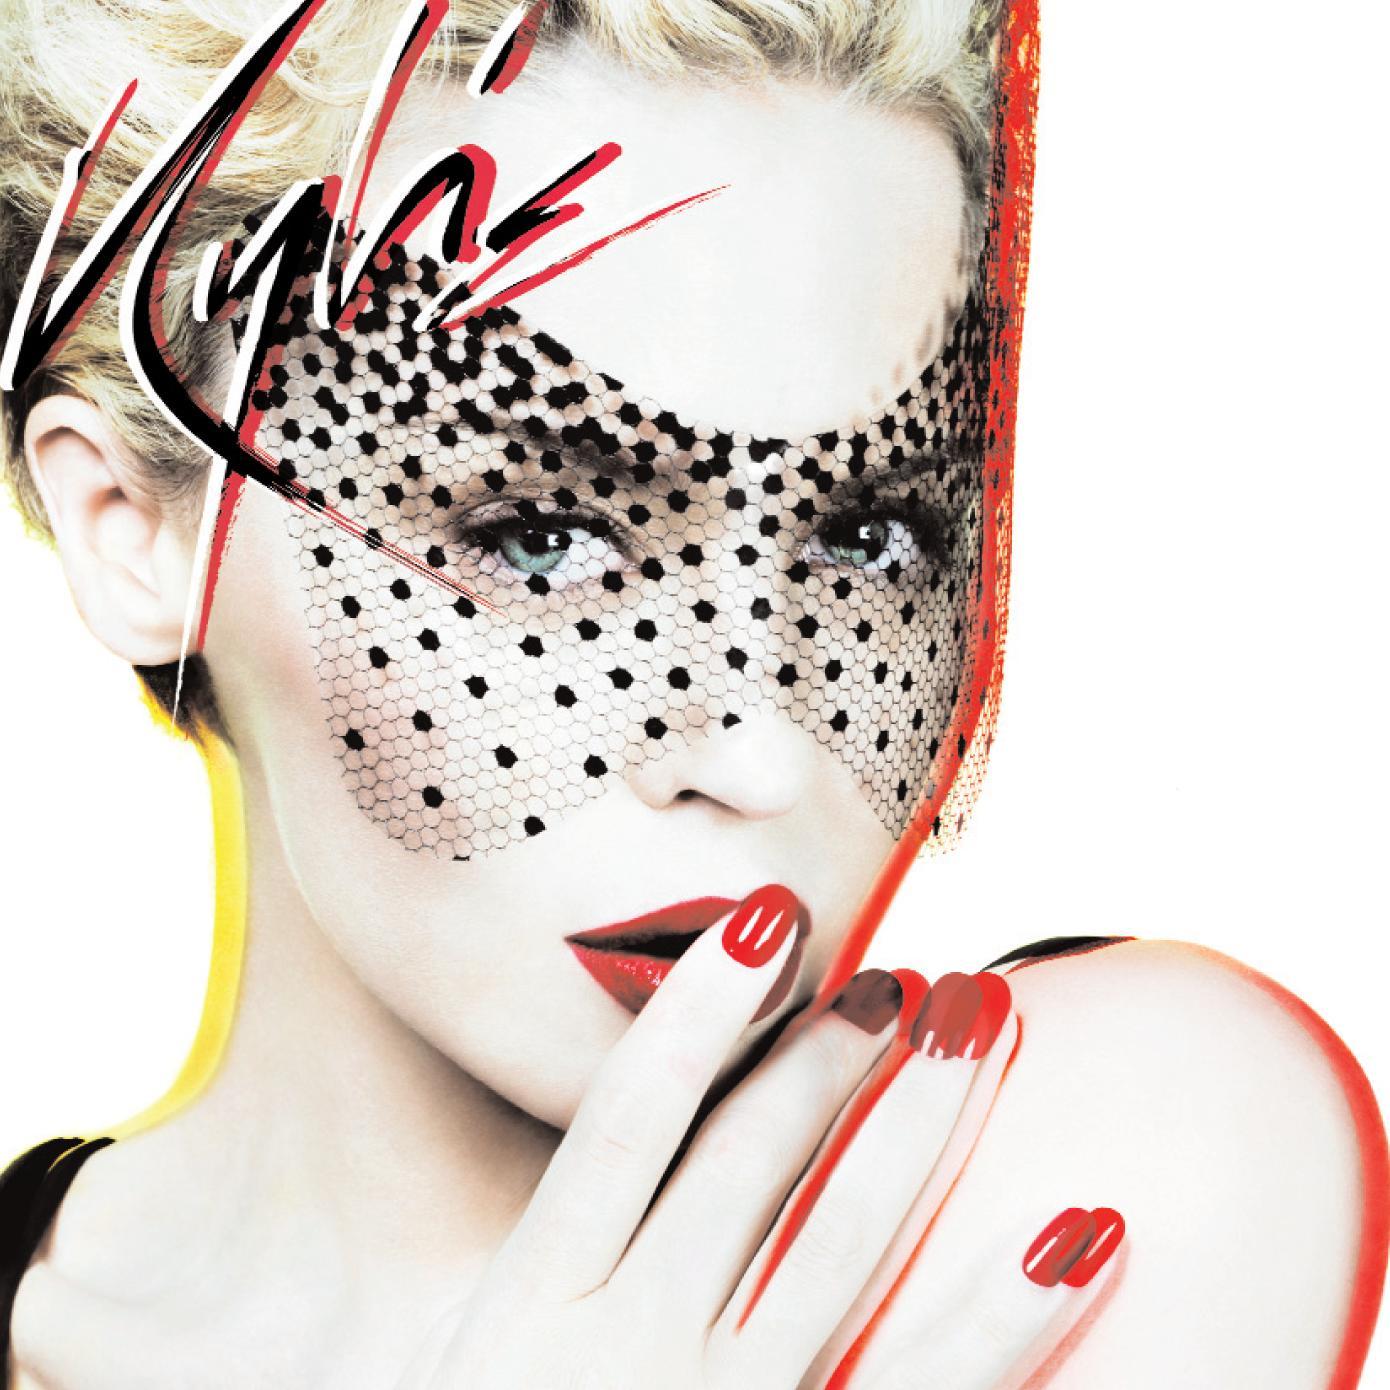 Kylie Minogue: Zgomotul facut de umerase ma inspaimanta!